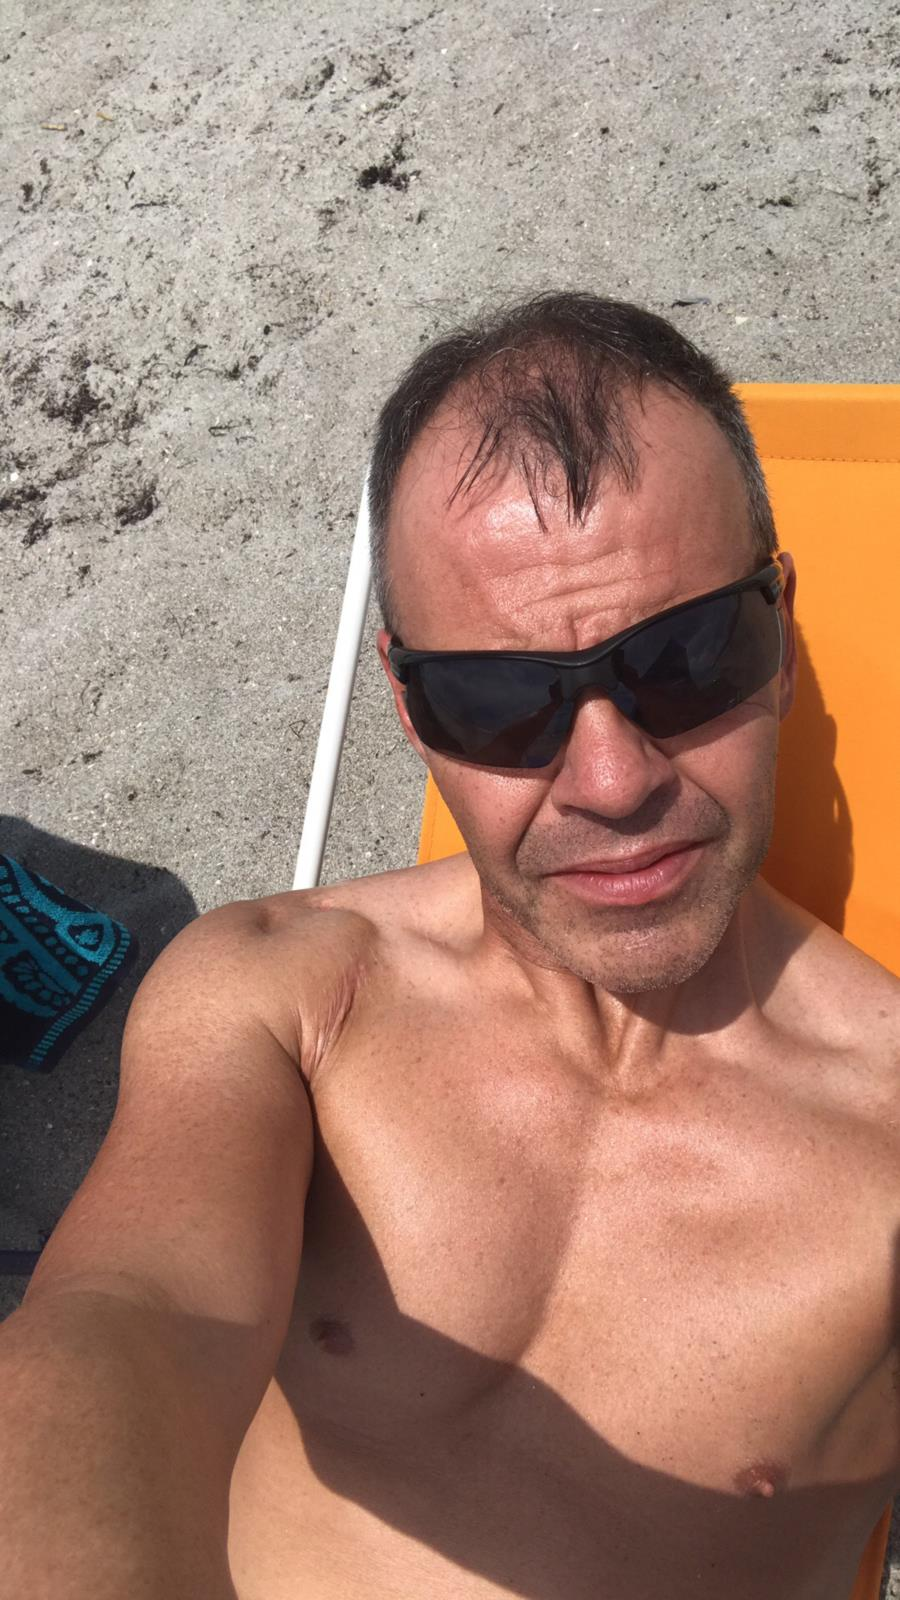 Florida - Vacation on the Beach